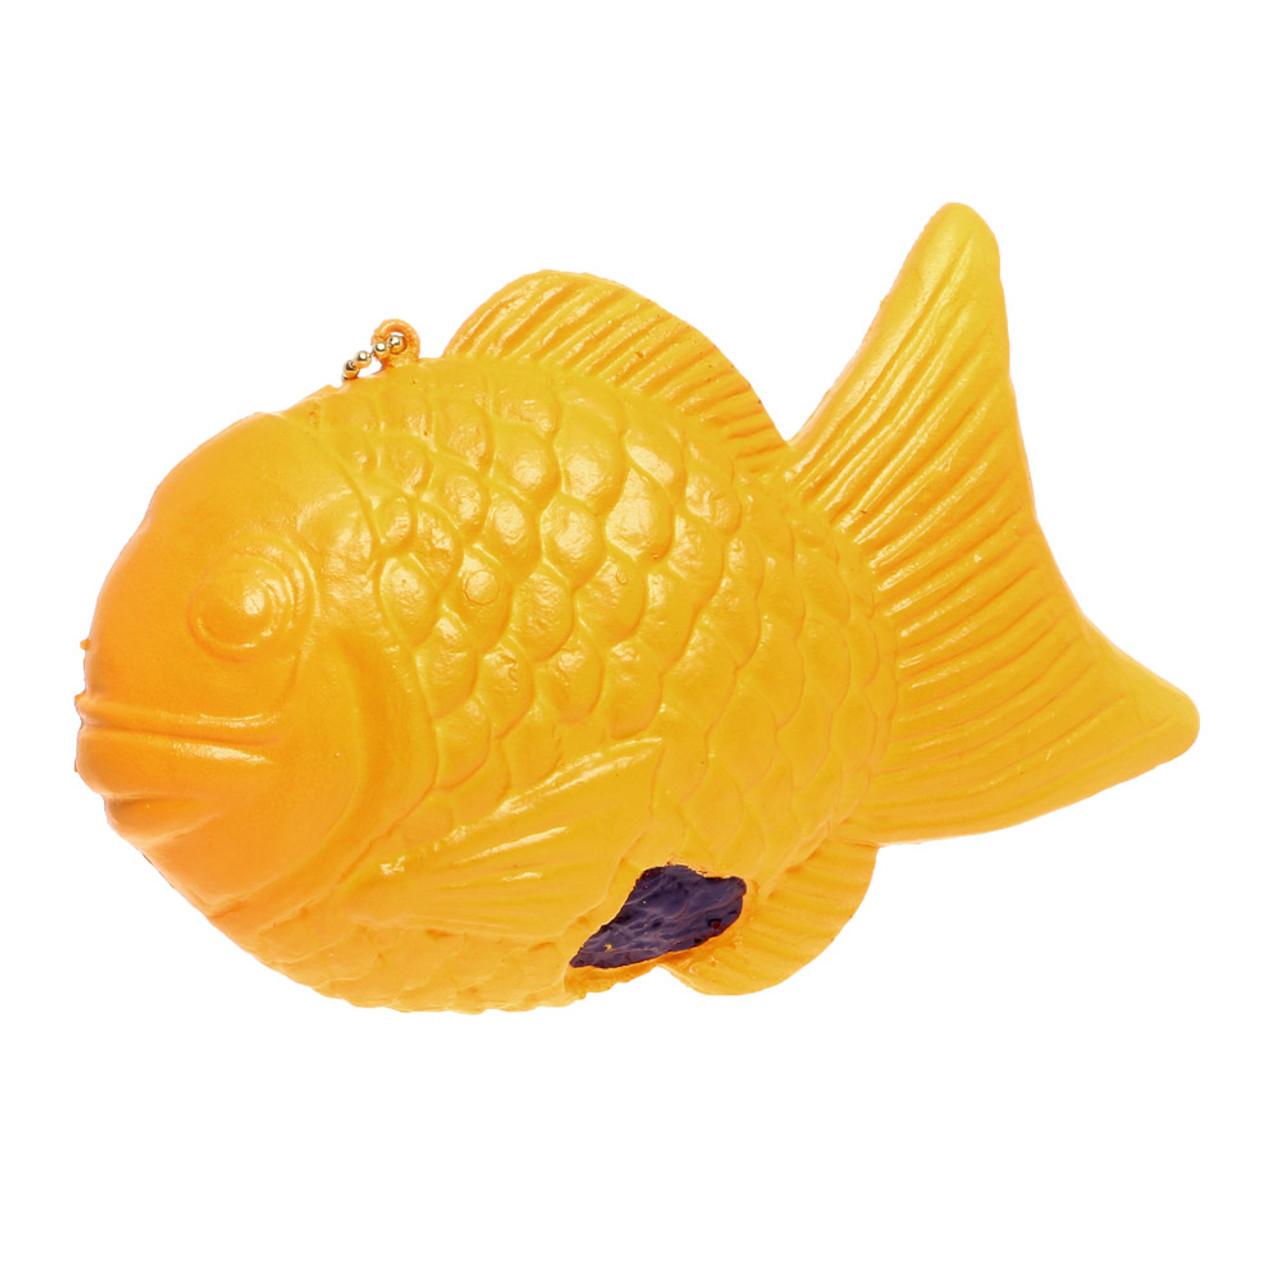 NIC Taiyaki Fish Shaped Cake Squishy Toy Charm ( Front View )